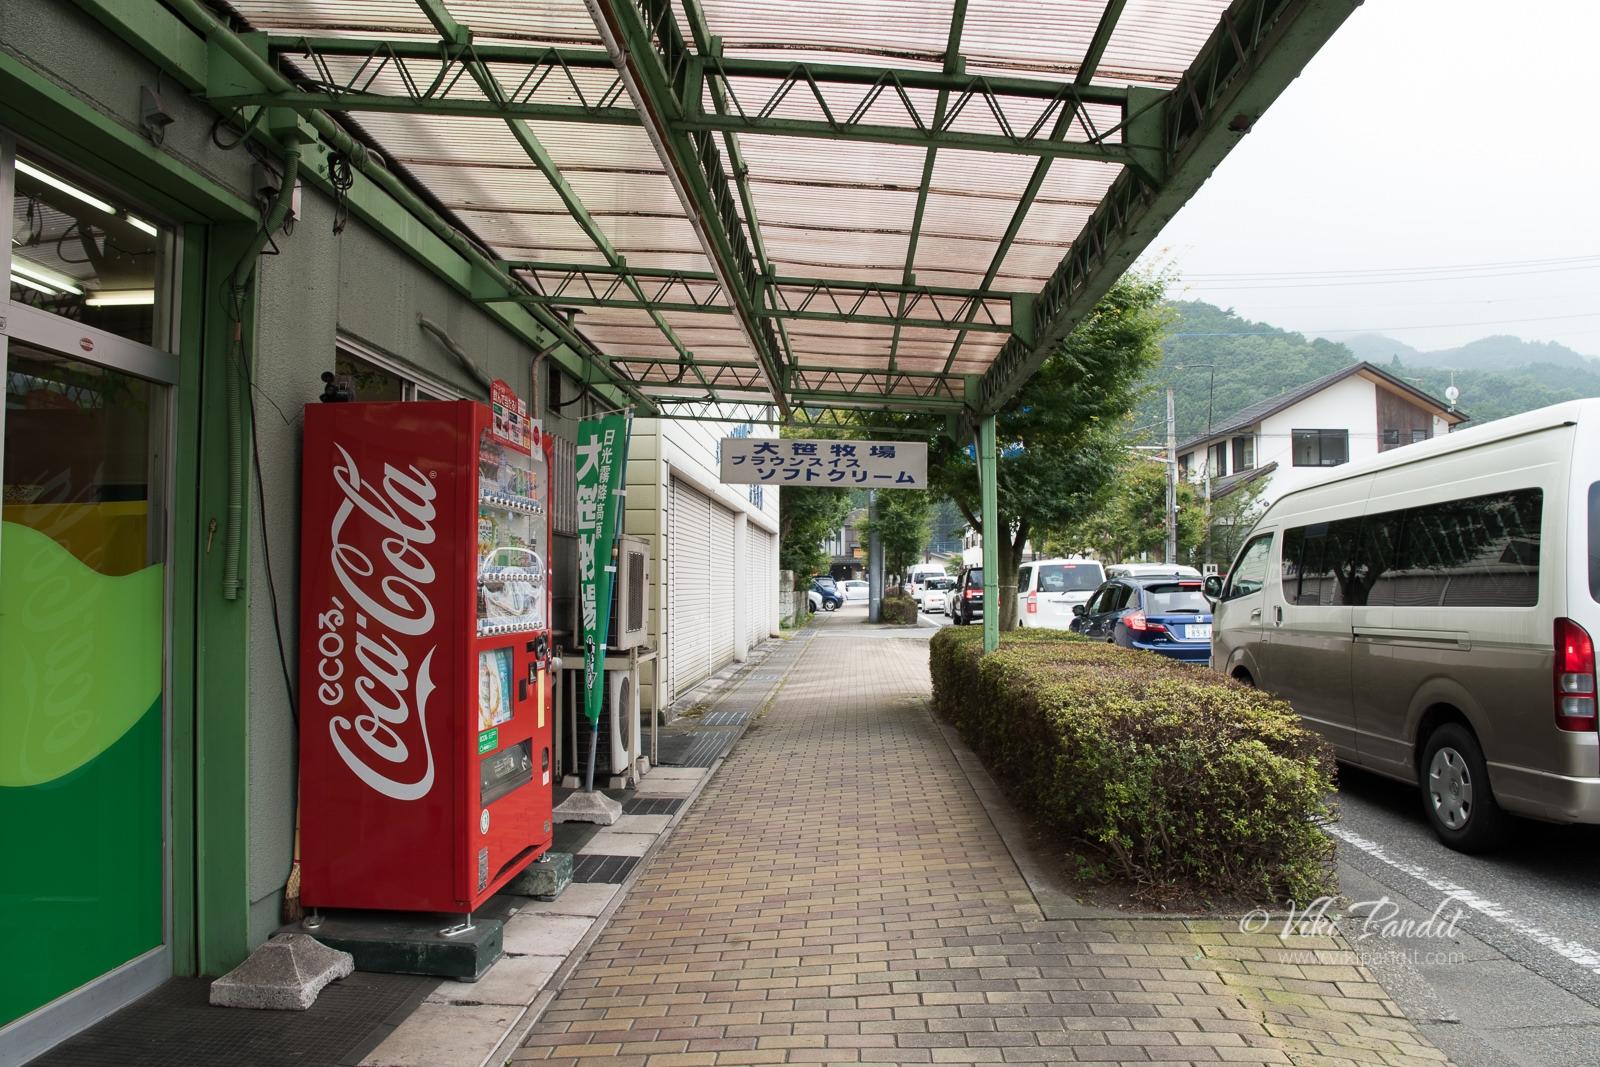 Streets of Nikko